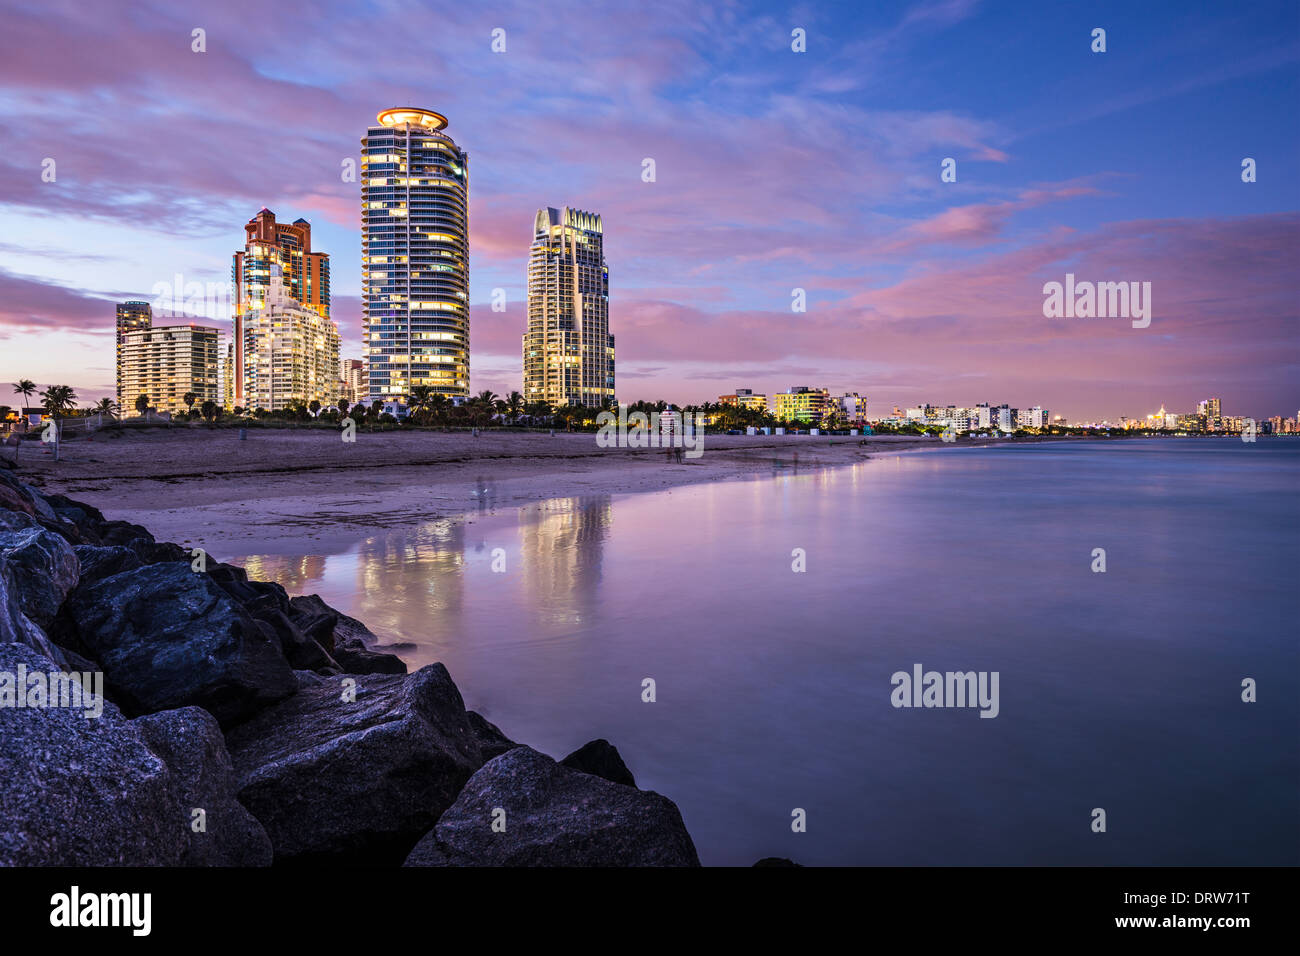 Miami, Florida at South Beach. - Stock Image